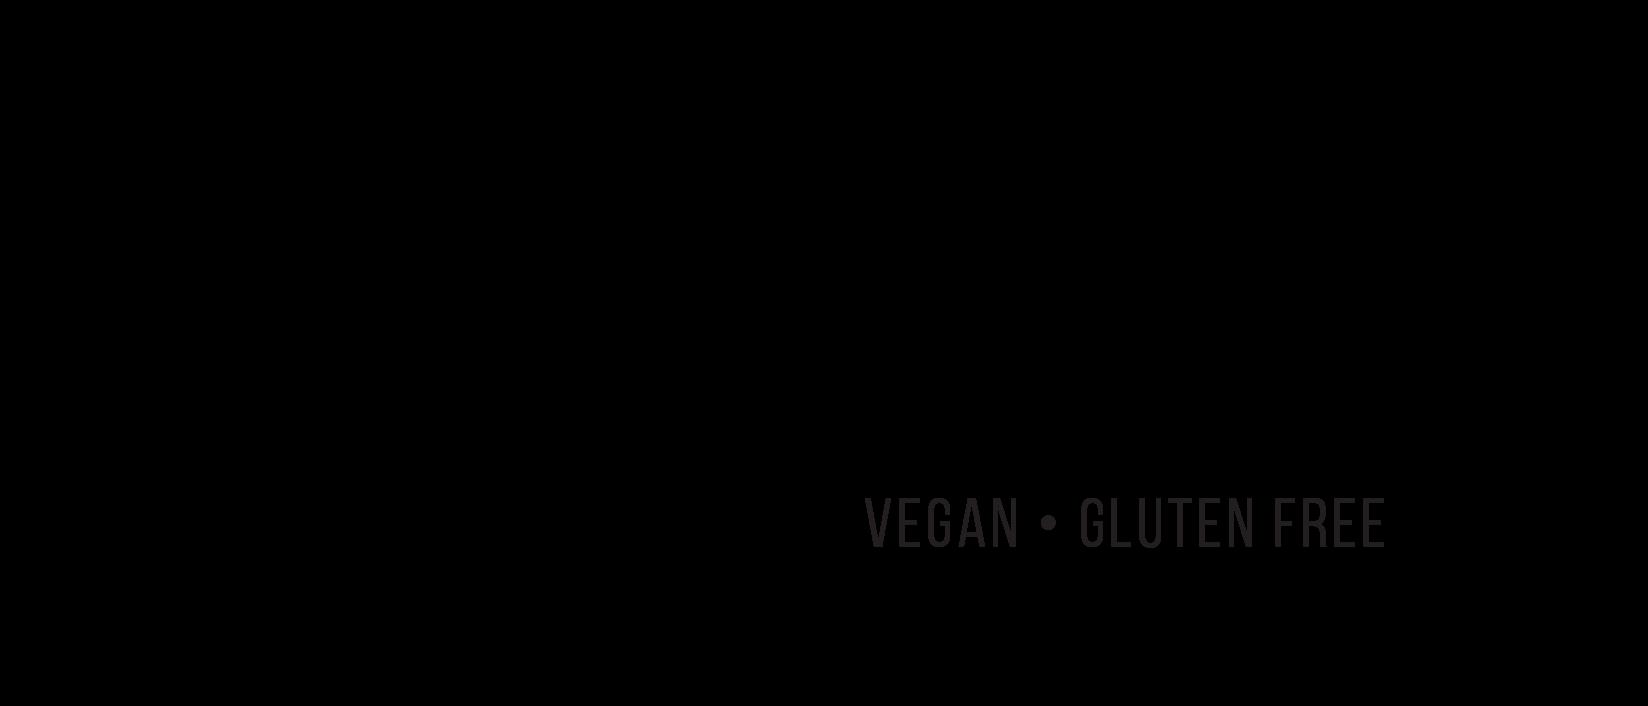 Delicious Vegan and Gluten Free Recipes